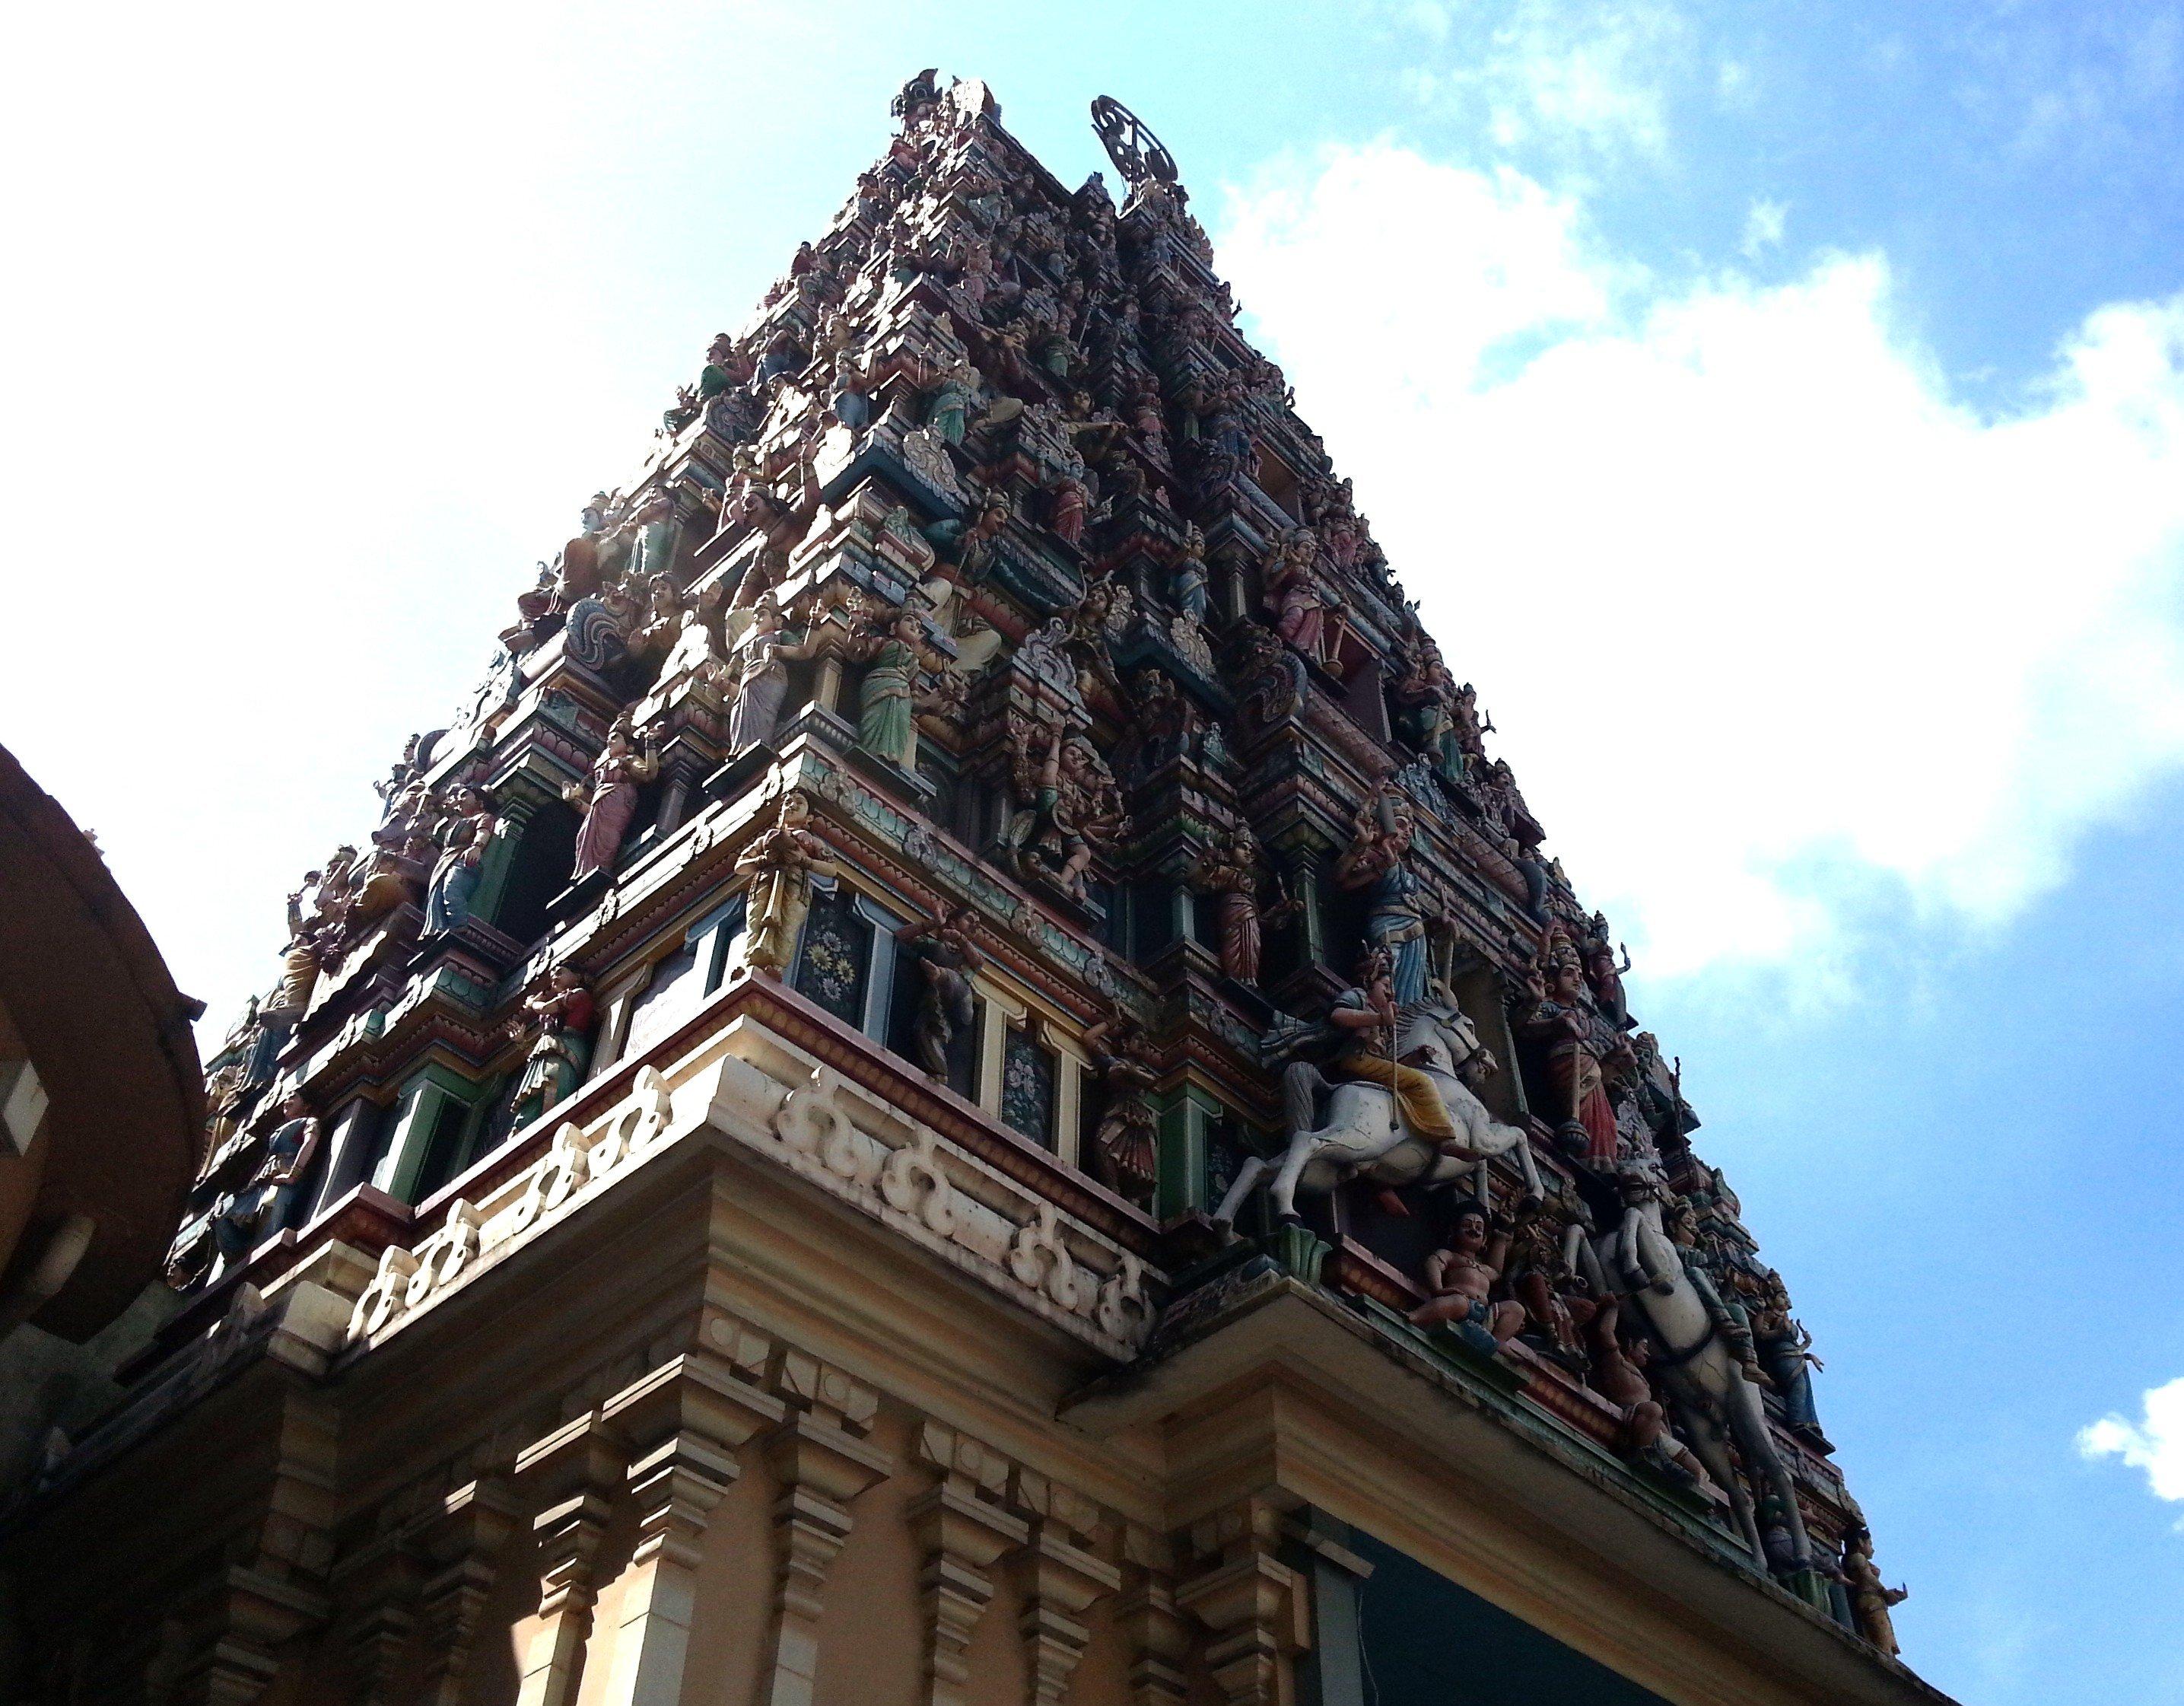 Sri Mahamariamman Temple in Kuala Lumpur